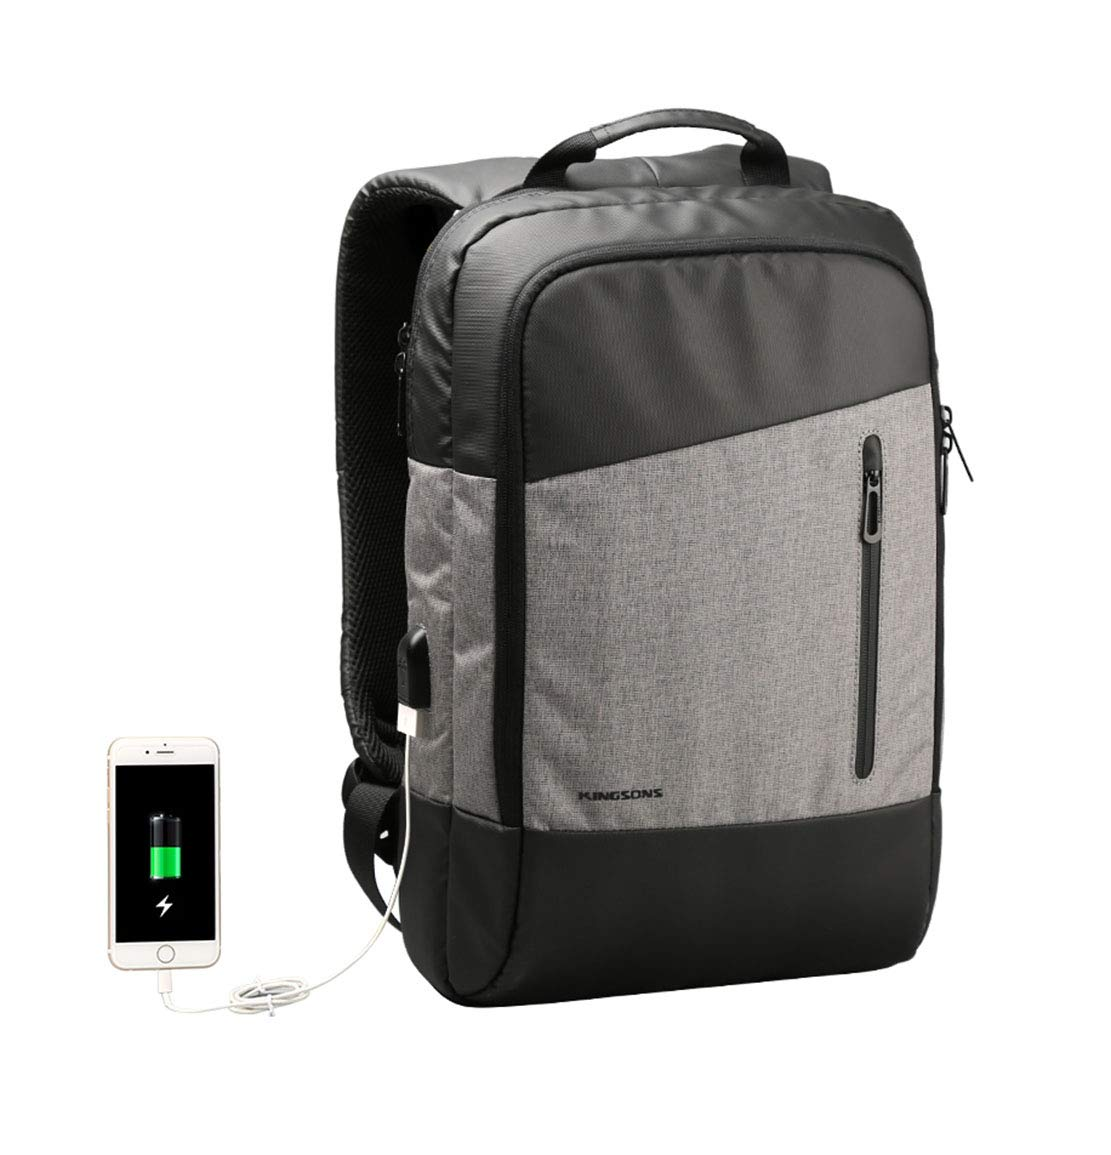 fc10d9297131 Amazon.com: JQXB Laptop Backpack, 15.6 inch Men Travel Computer ...